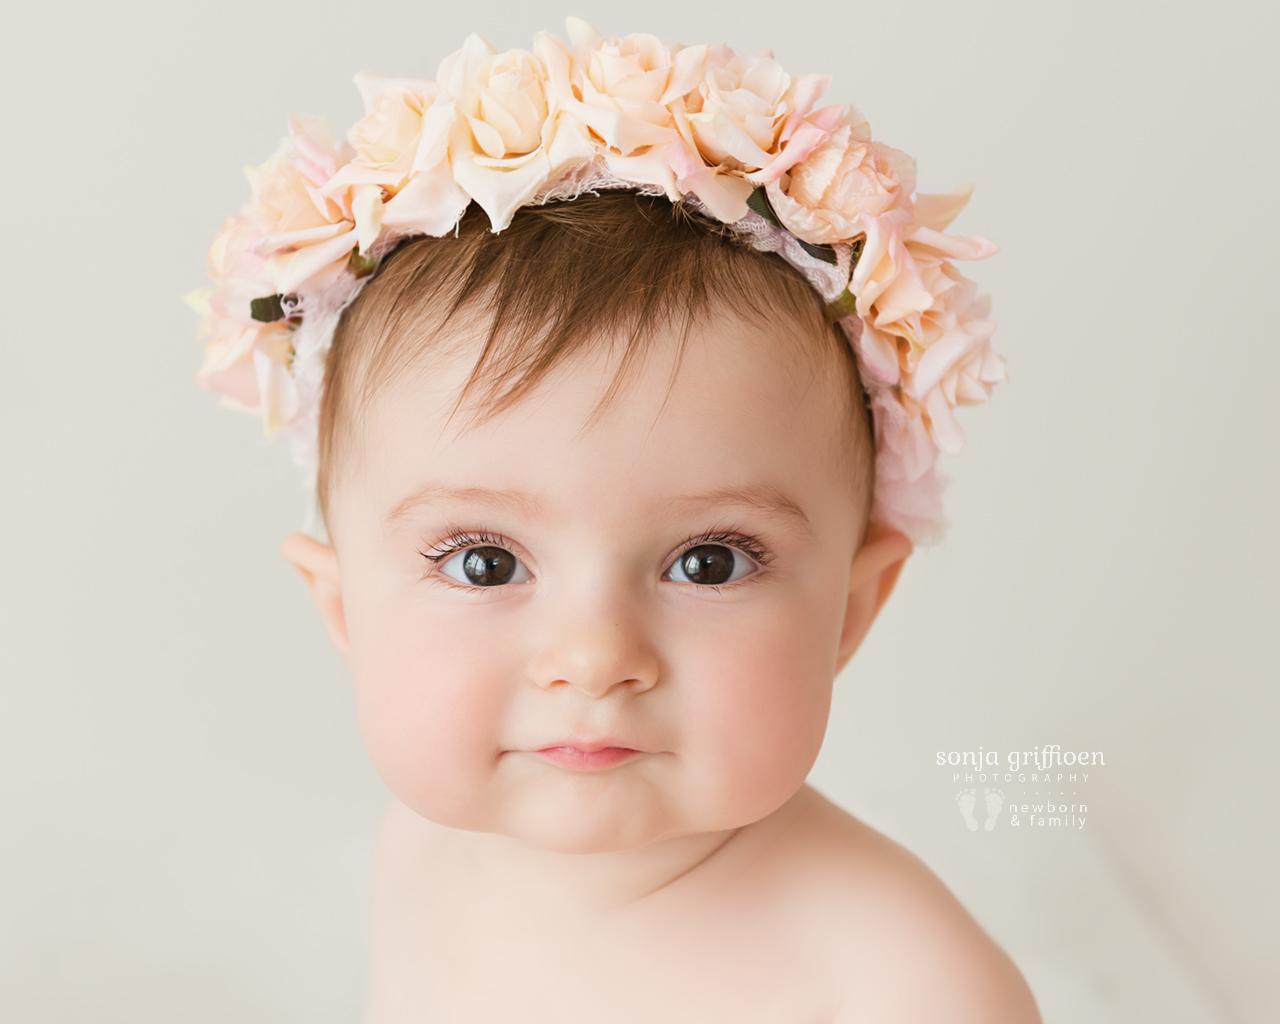 Annabella-Milestone-Brisbane-Baby-Photographer-Sonja-Griffioen-11.jpg